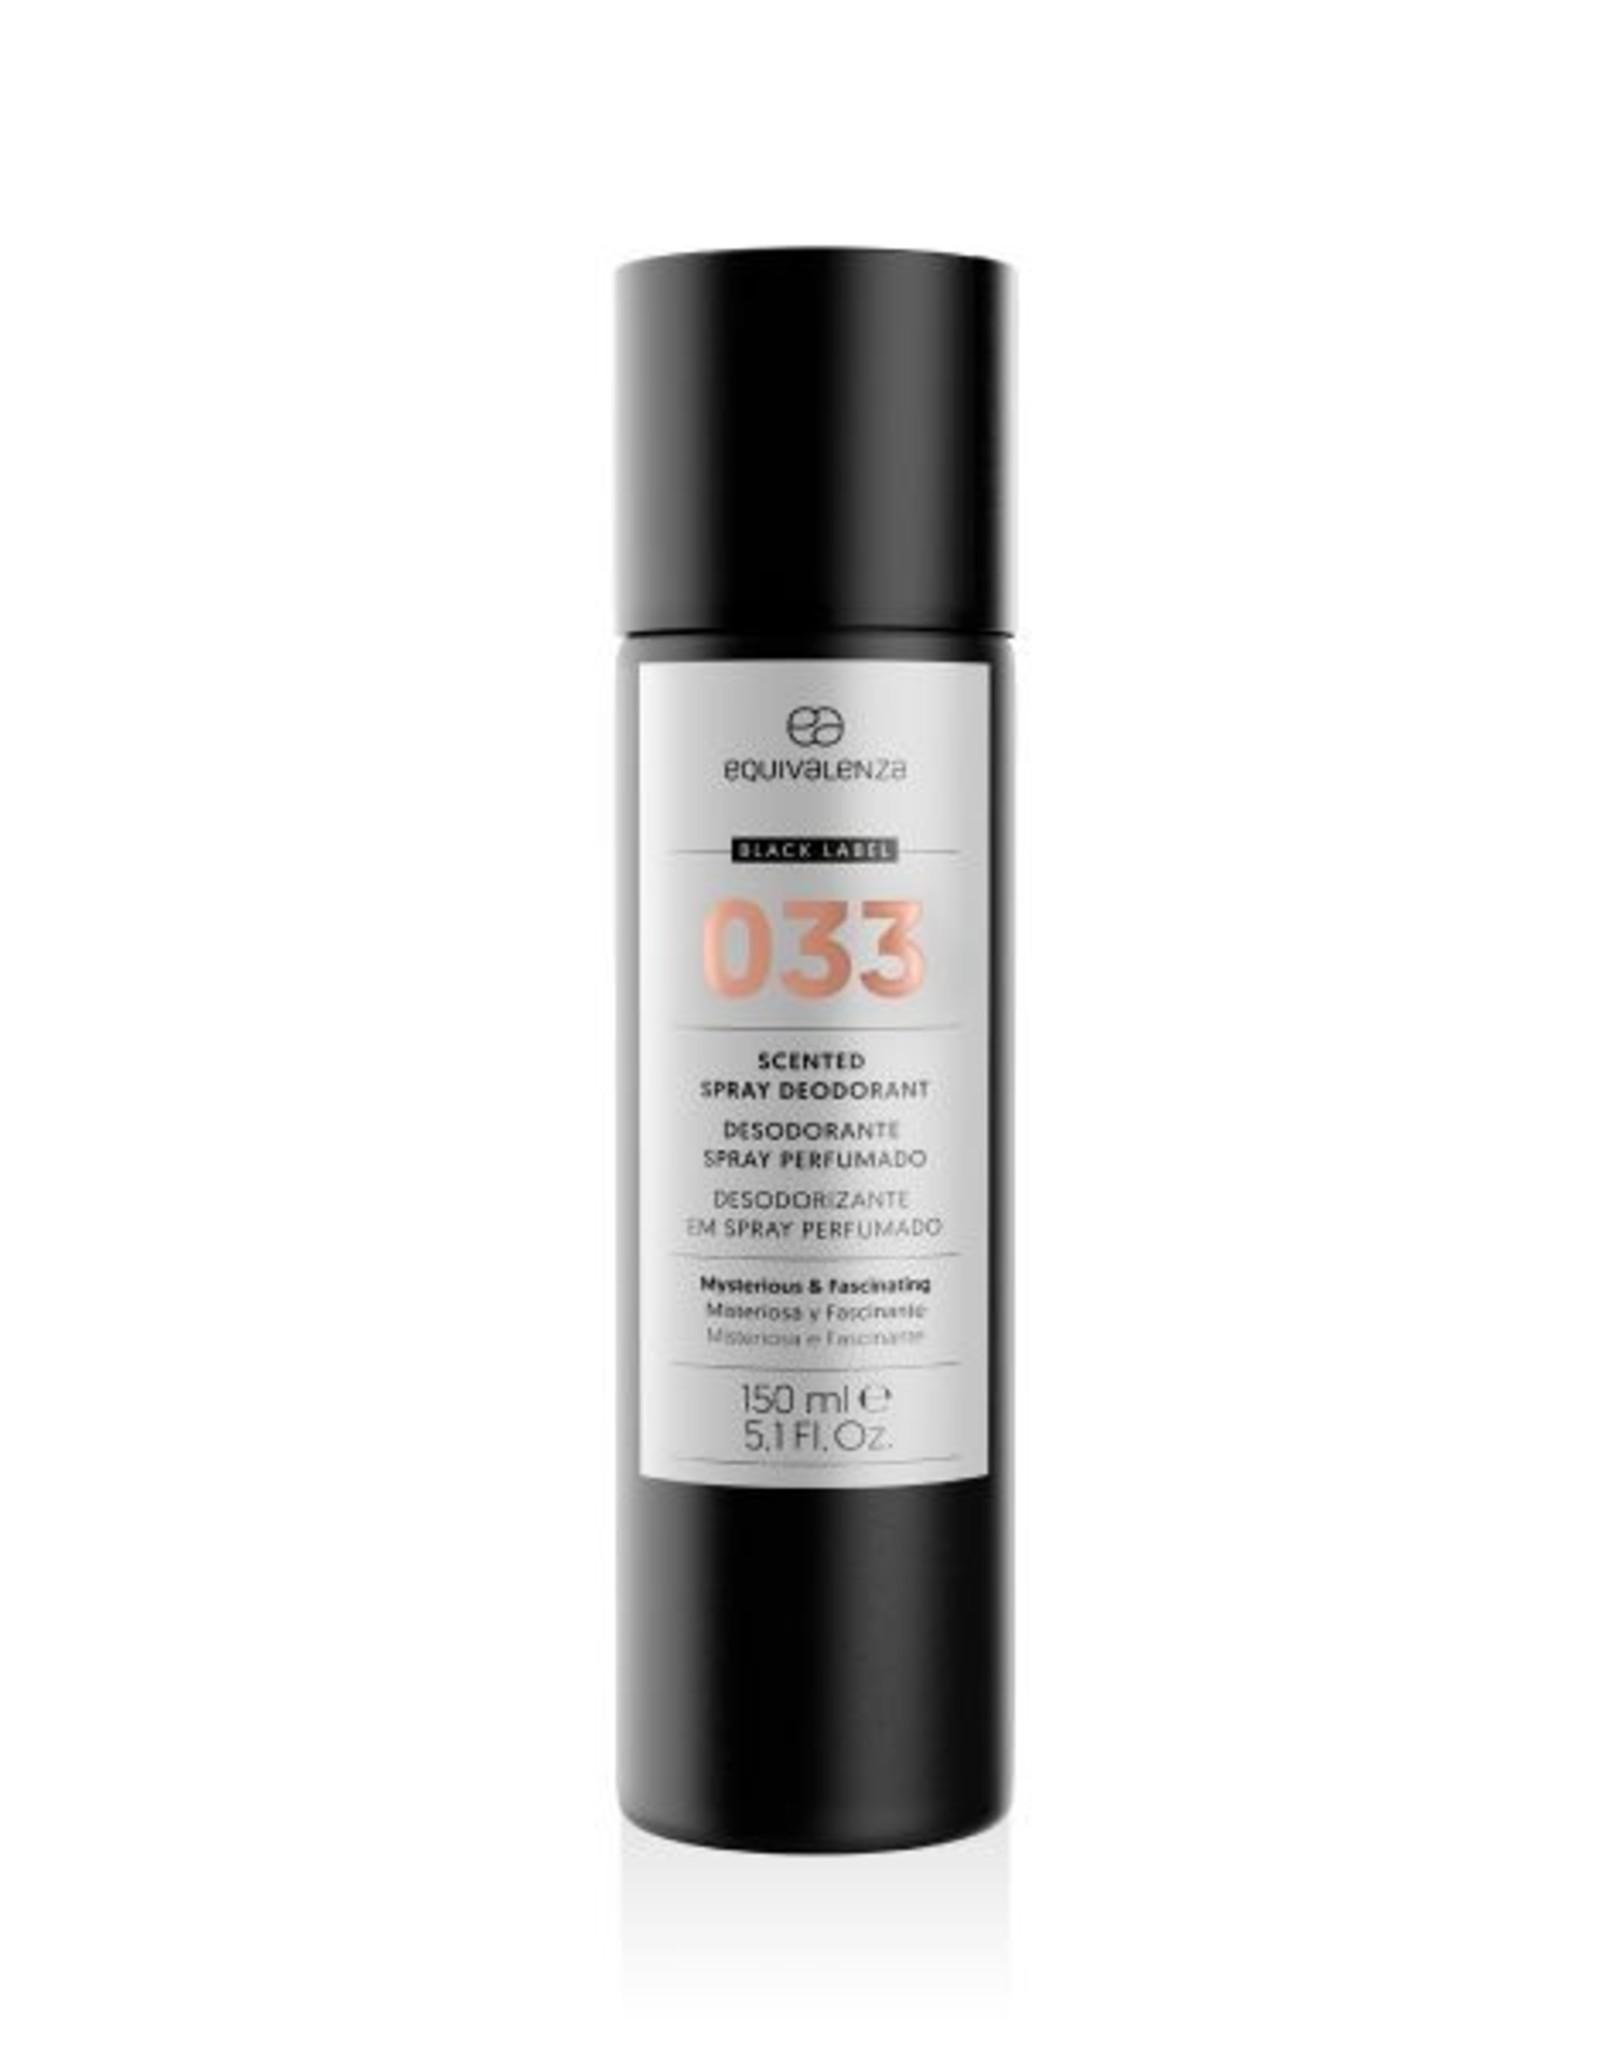 Equivalenza Black Label Deodorant 033